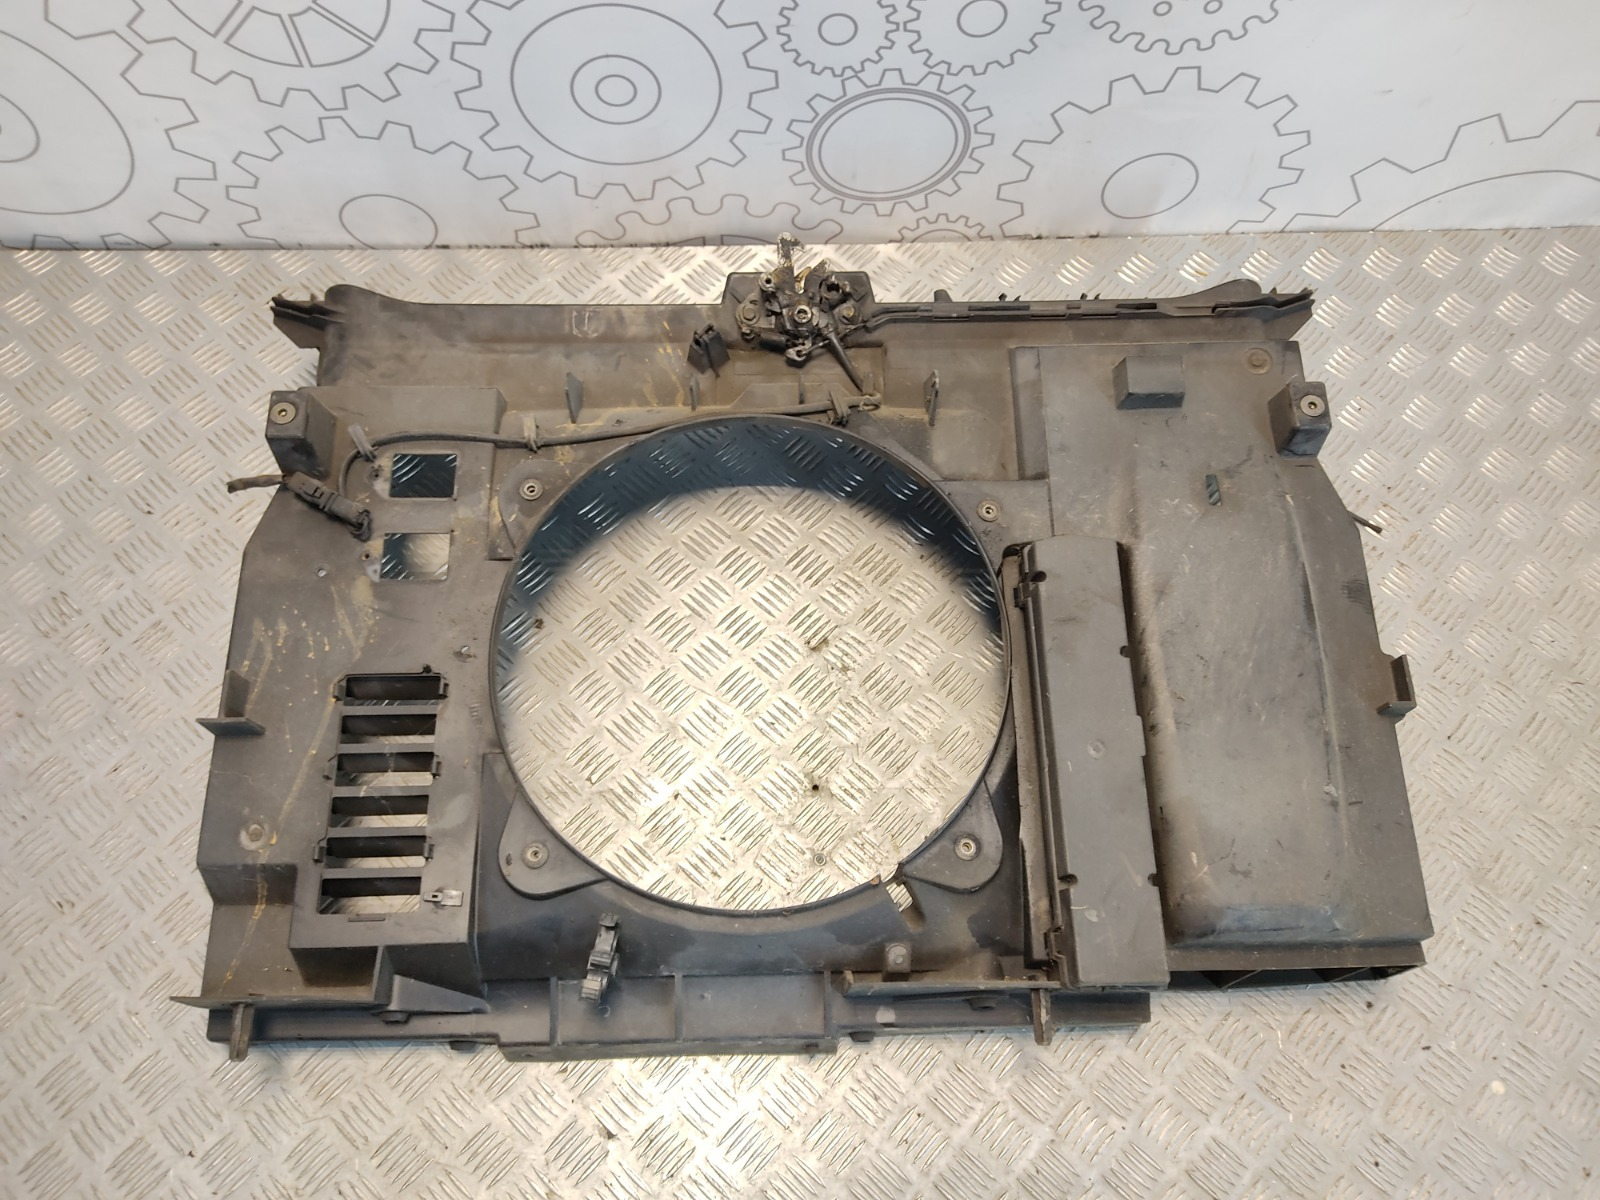 Диффузор вентилятора Fiat Ulysse 2.0 I 2005 (б/у)